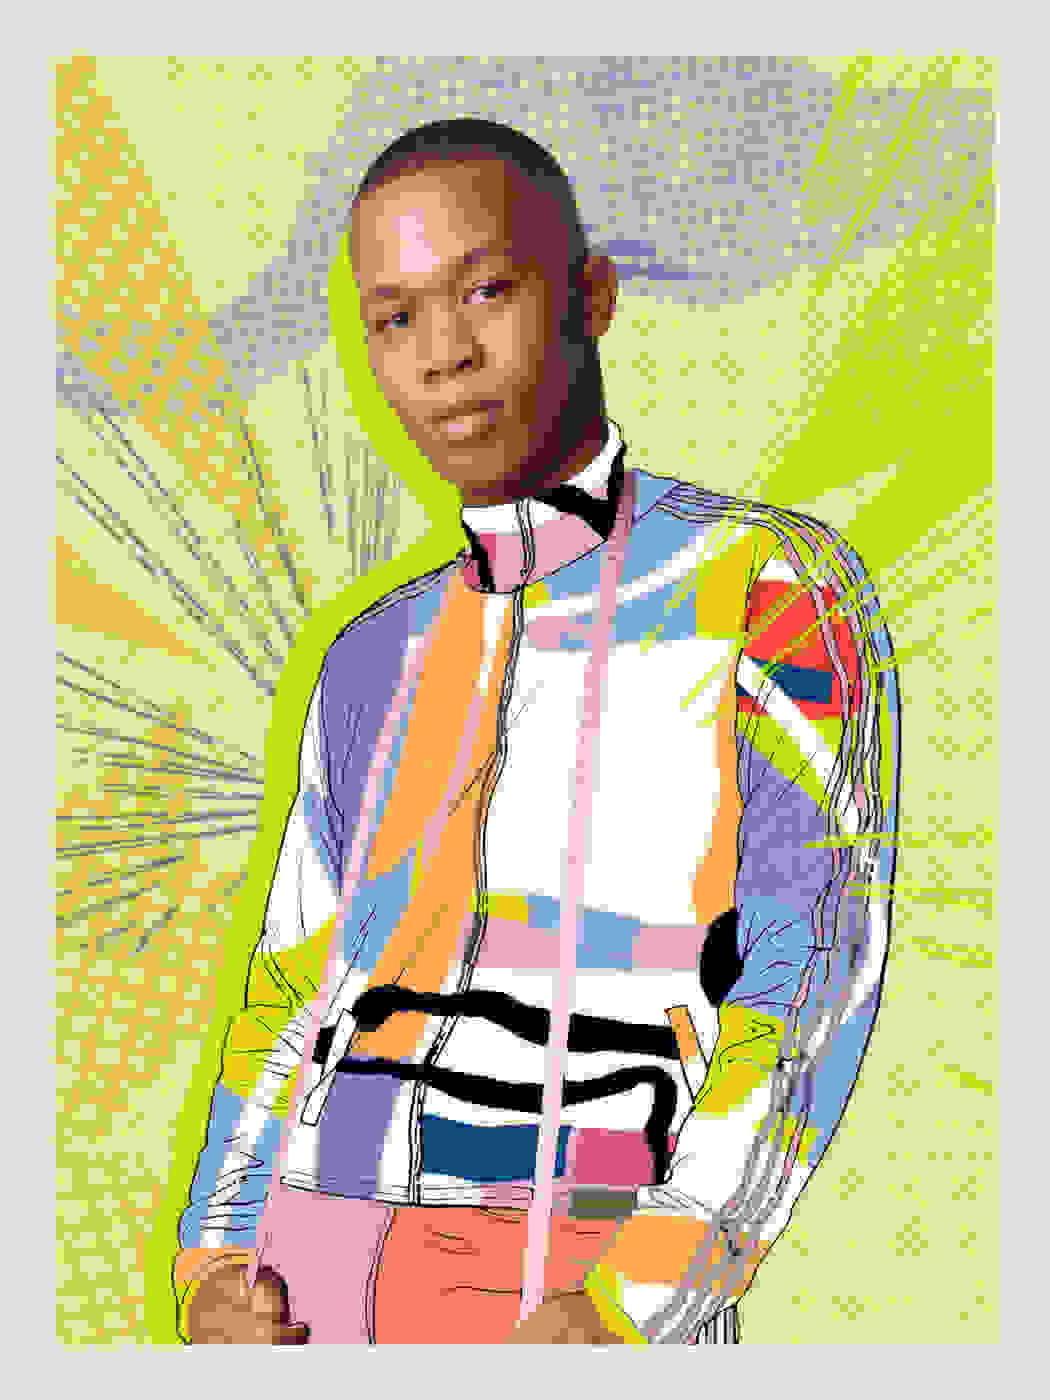 Collage featuring Pride representative.